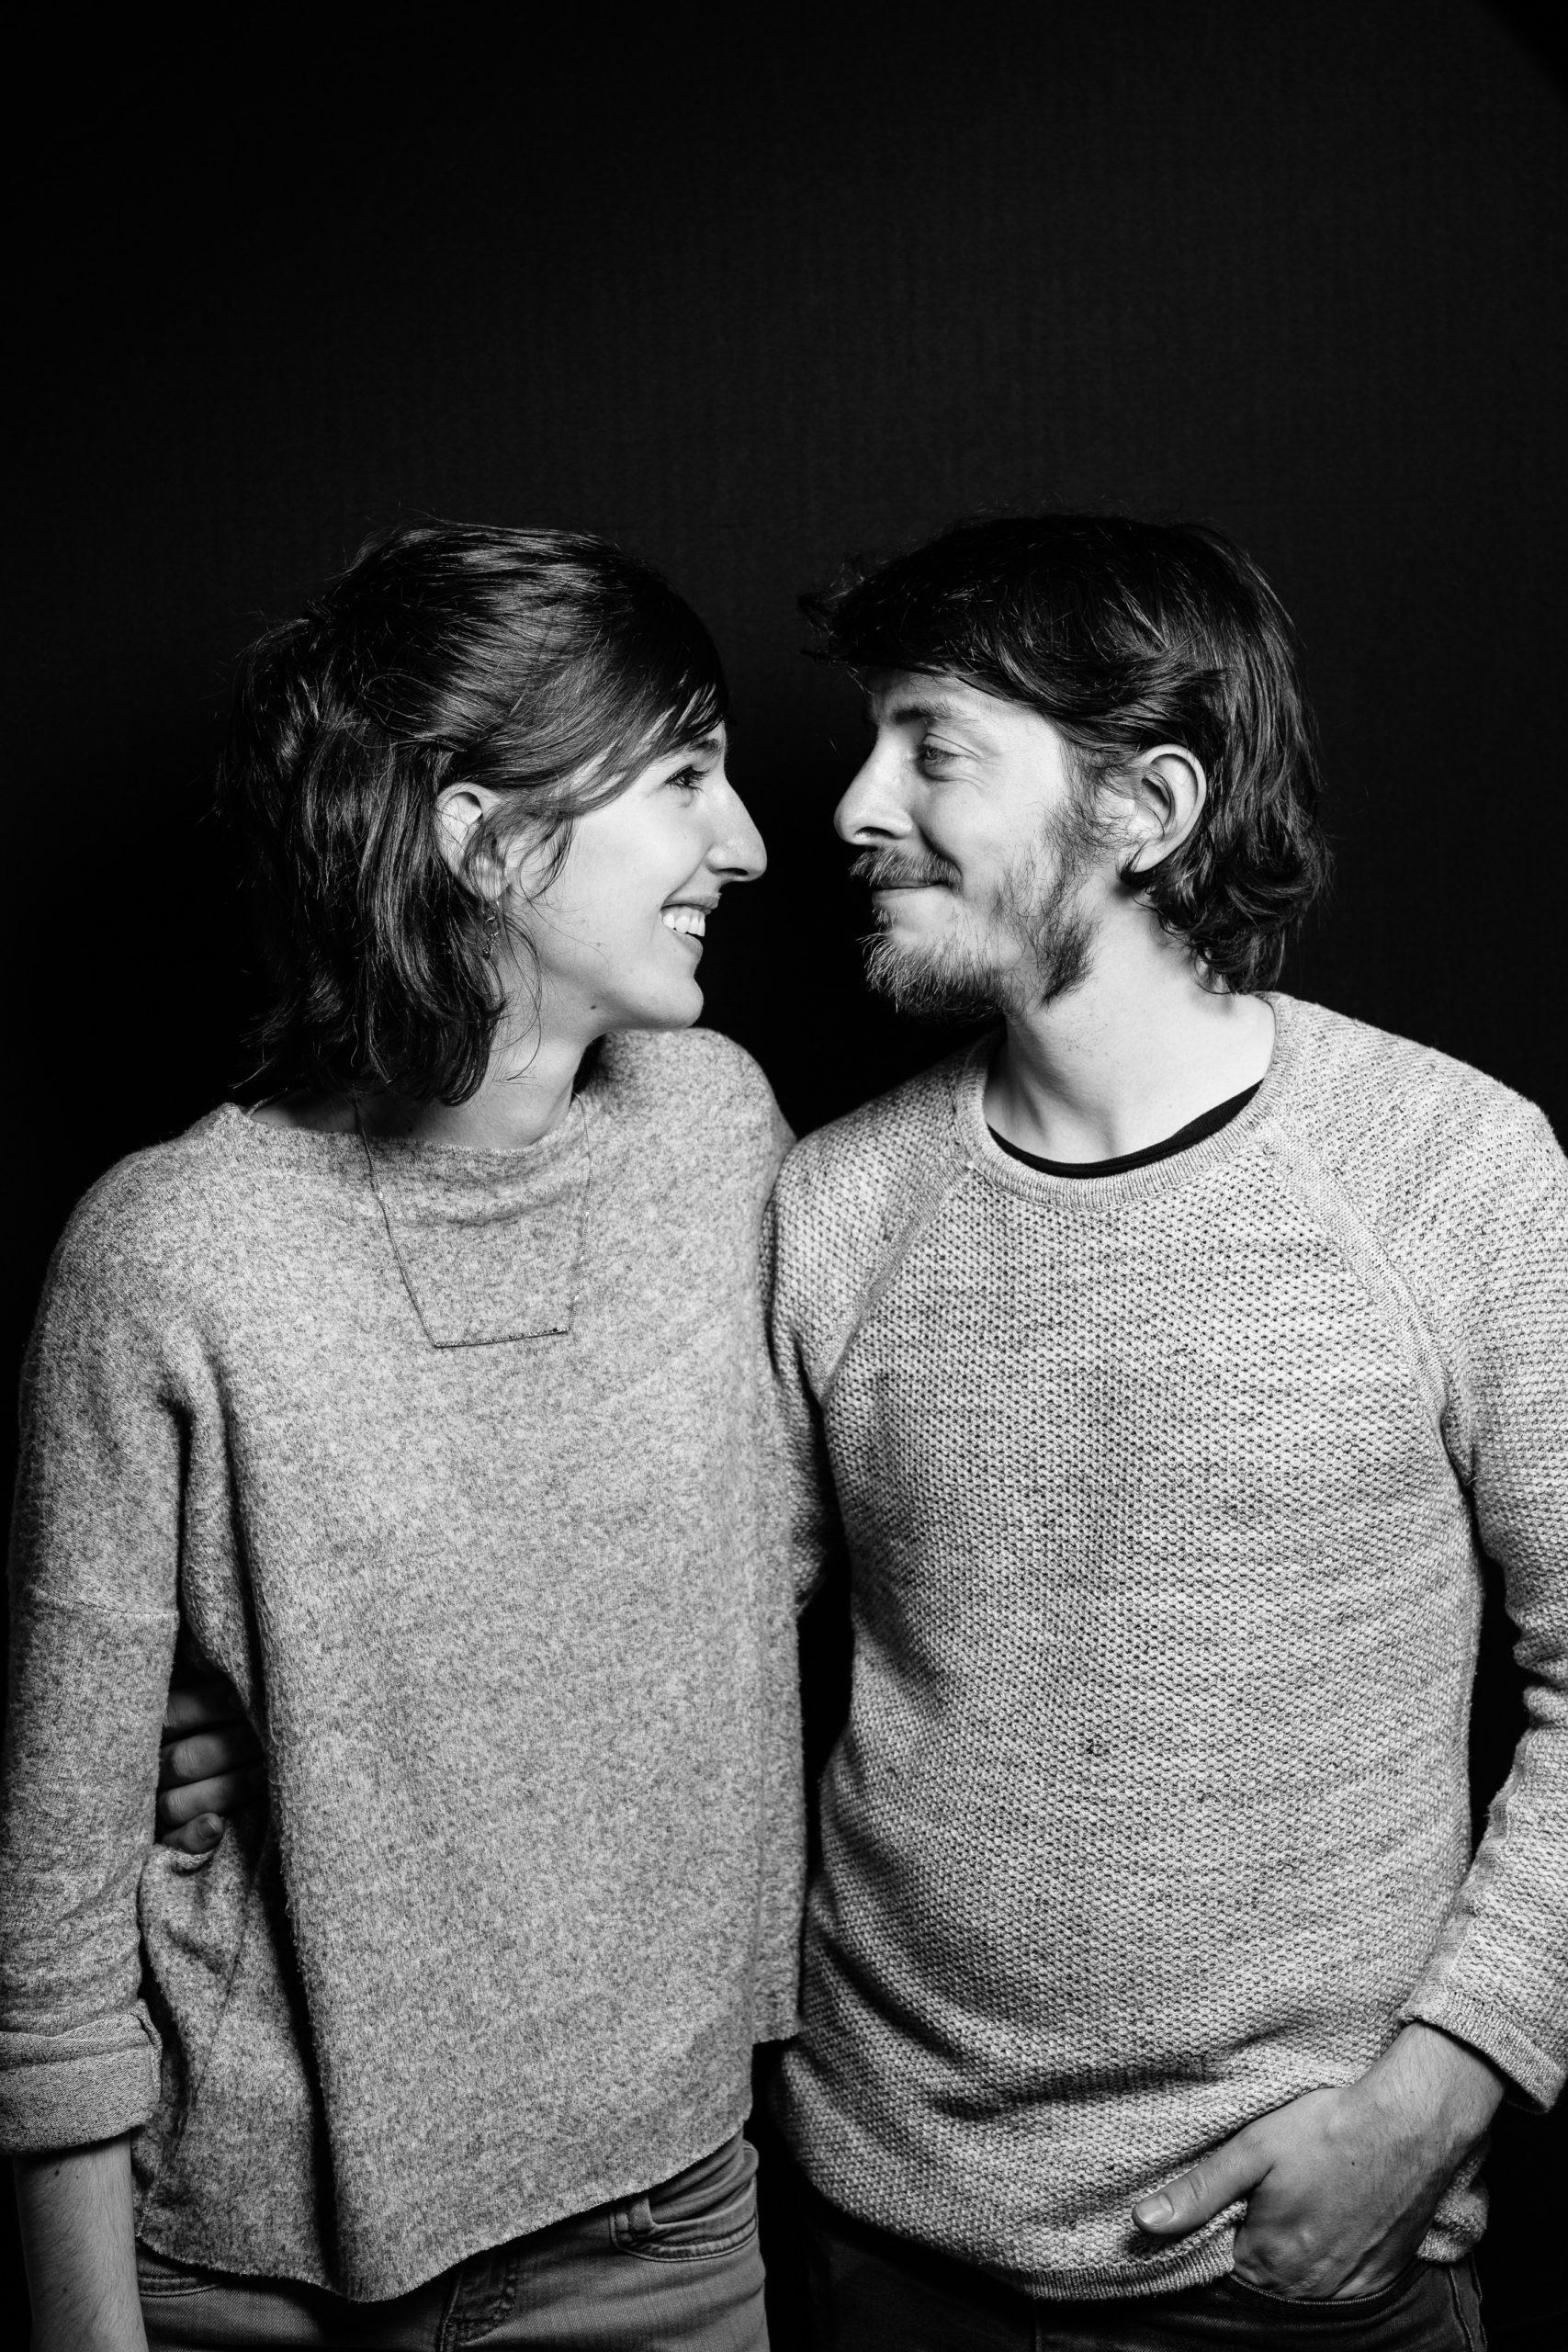 Jacques & Lise